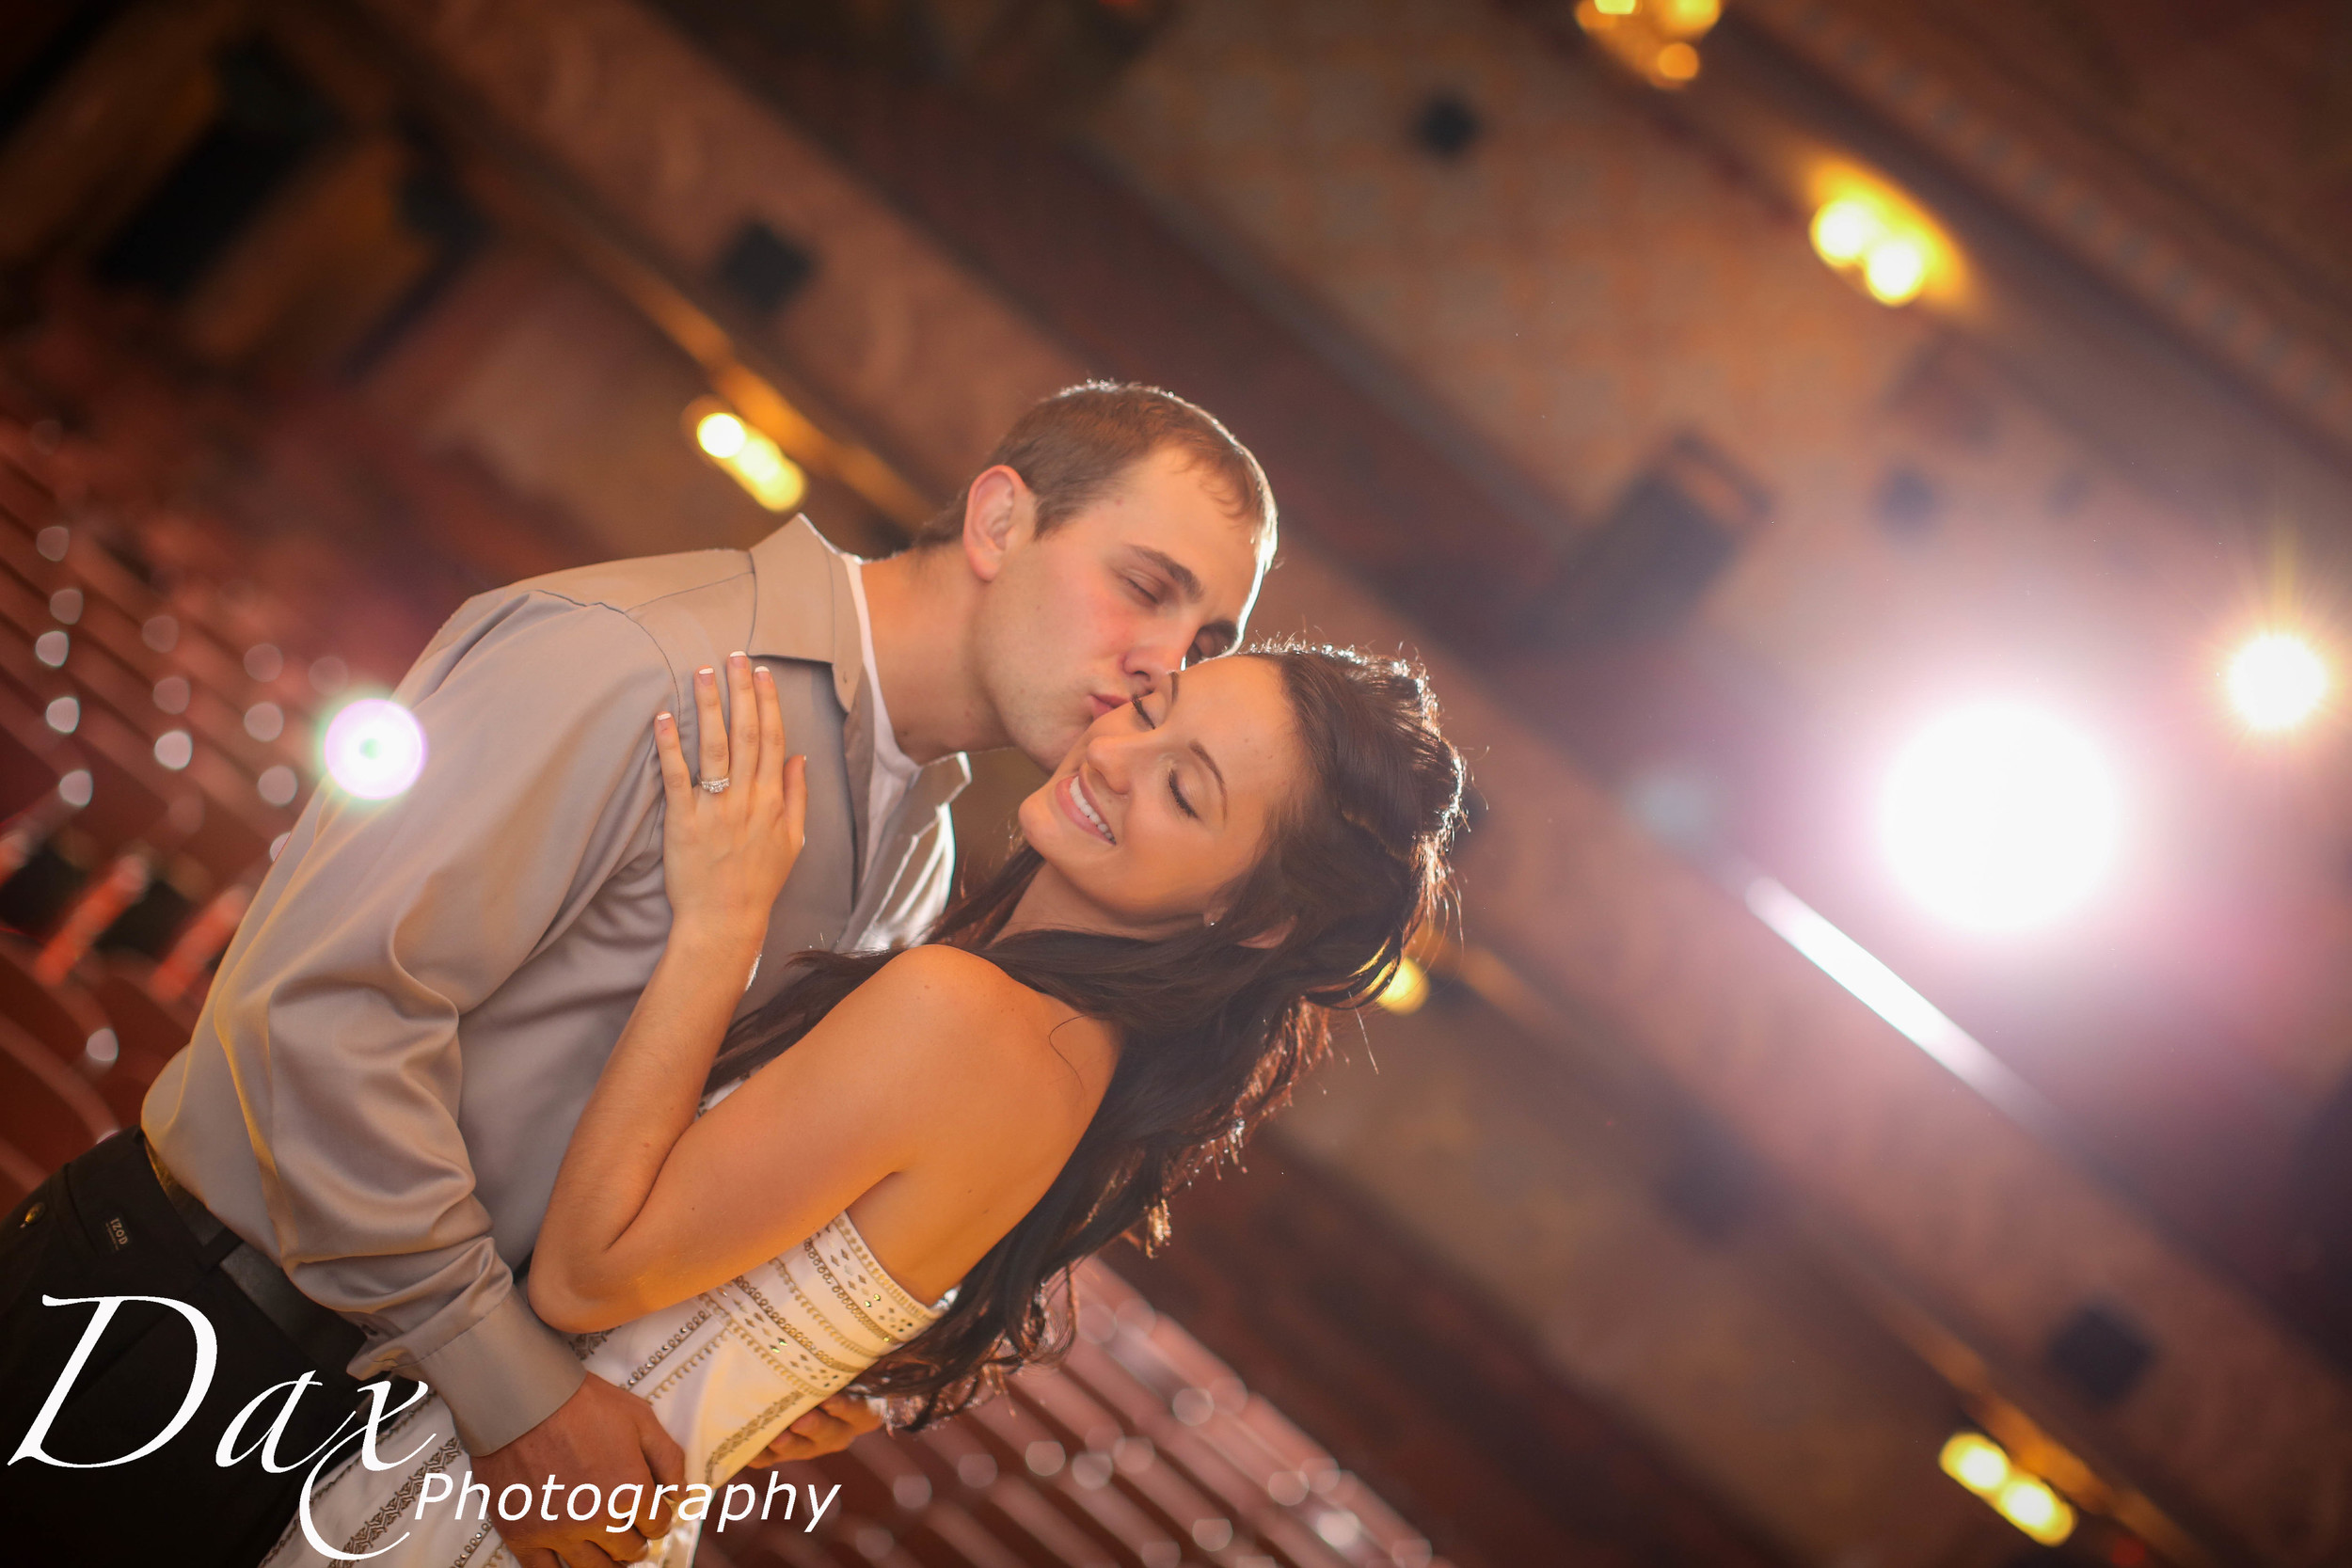 wpid-Montana-photographer-Engagement-Portrait-6184.jpg